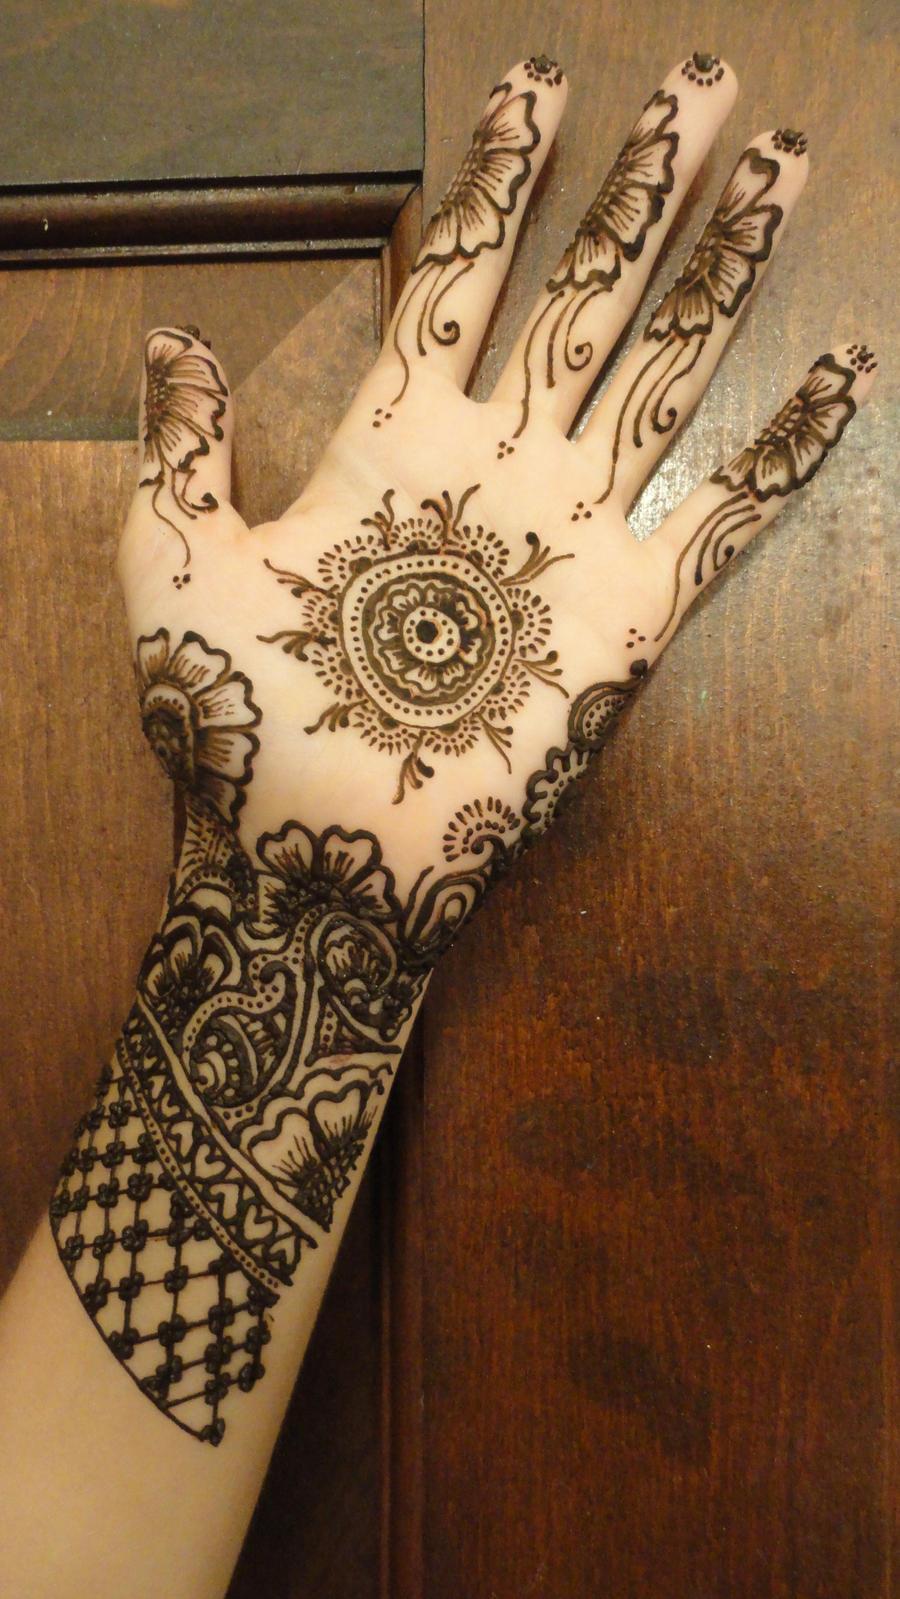 Group Mehndi Hands : Eid henna by a w man on deviantart